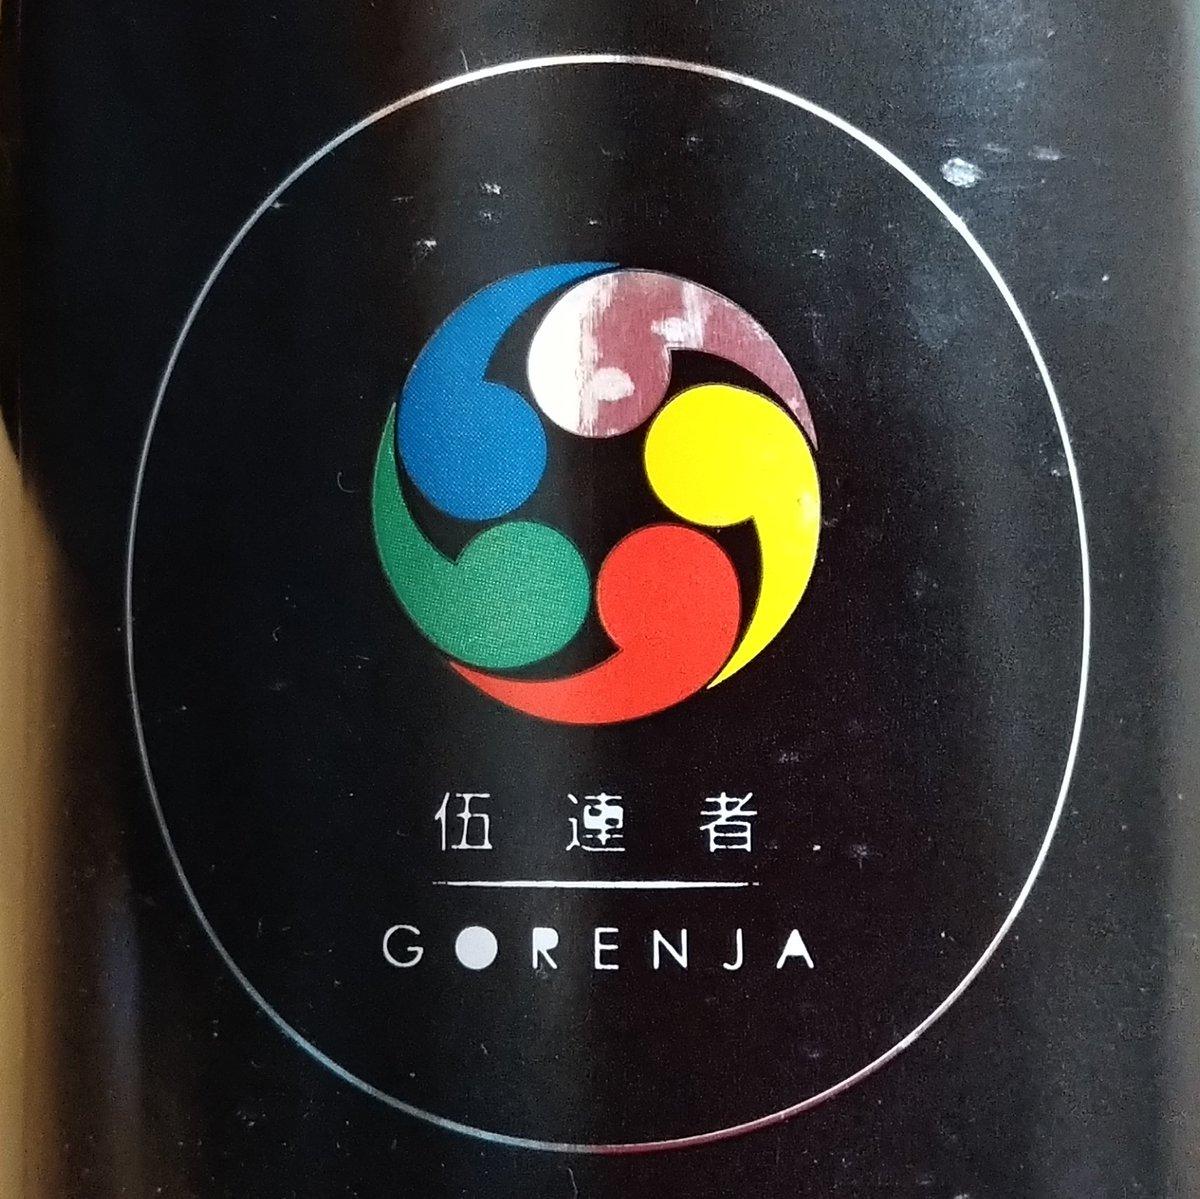 test ツイッターメディア - 鈴木酒造店の磐城壽式生酛純米吟醸酒「伍連者」。 うまいんですが、なんでこんな名前に。^^; https://t.co/zqR0v08wFG